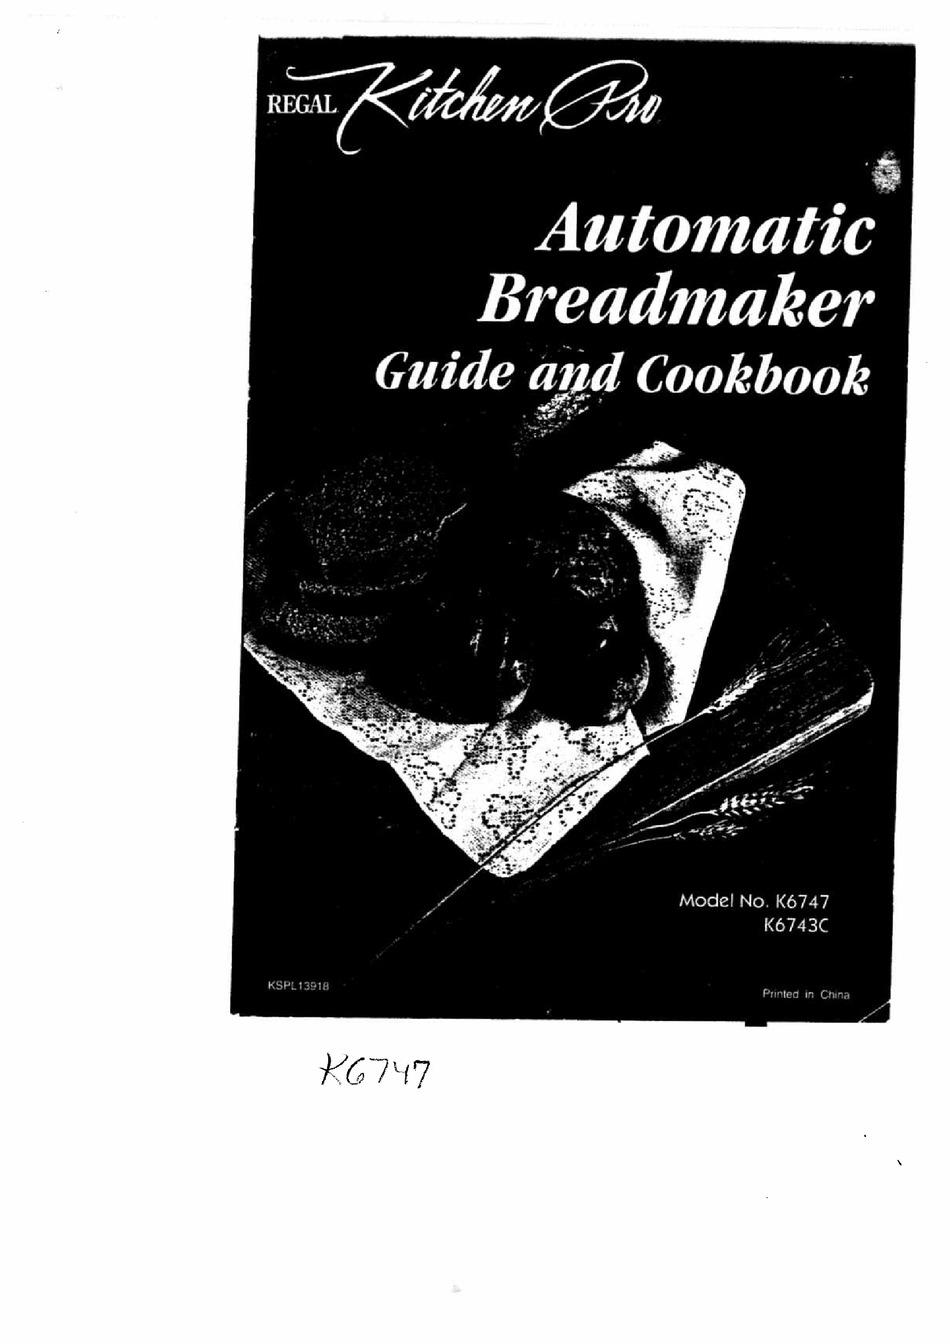 REGAL KITCHEN PRO K12 MANUAL AND COOKBOOK Pdf Download   ManualsLib